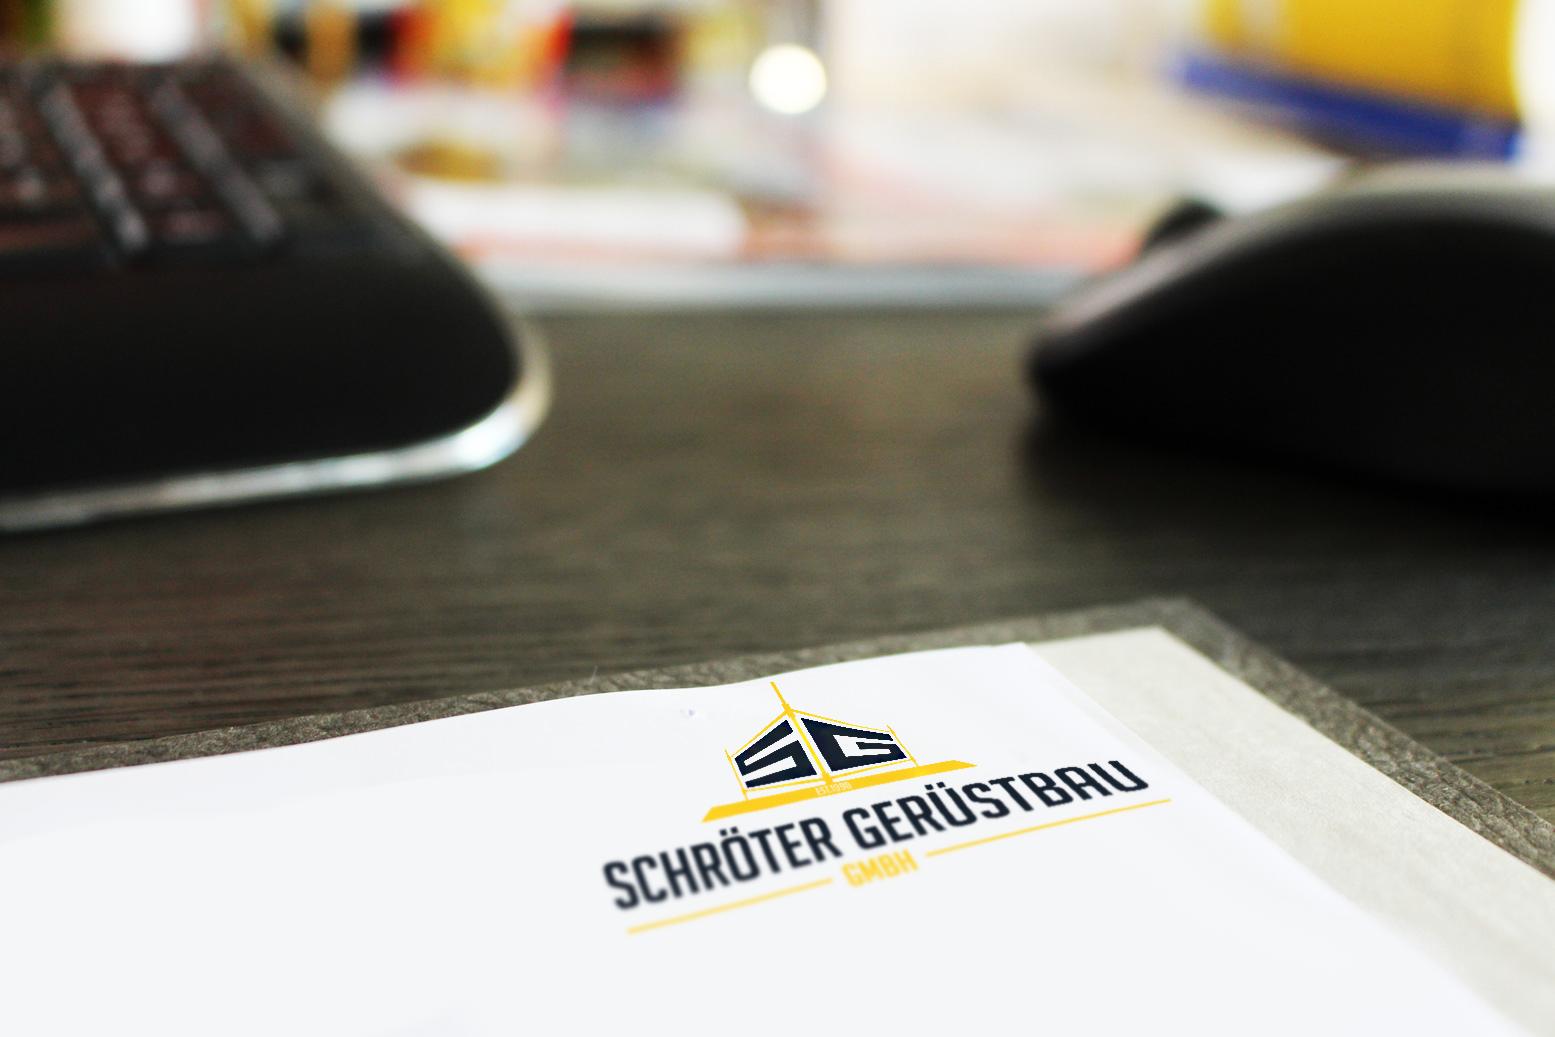 Sekretariat - Geschäftsführung